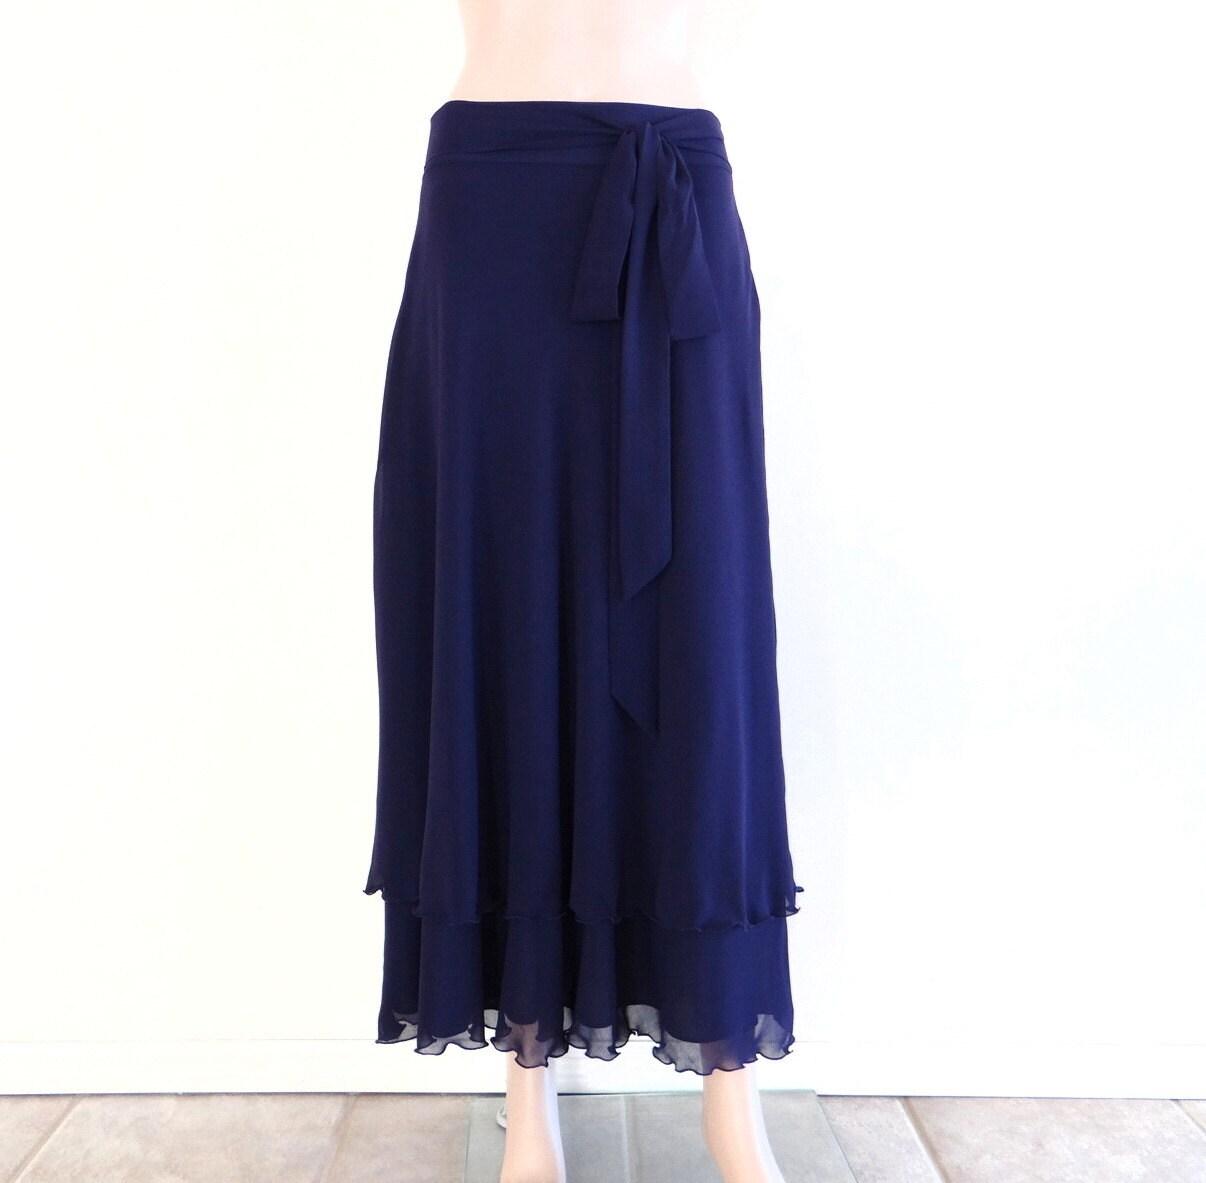 navy blue maxi skirt chiffon floor length skirt navy blue